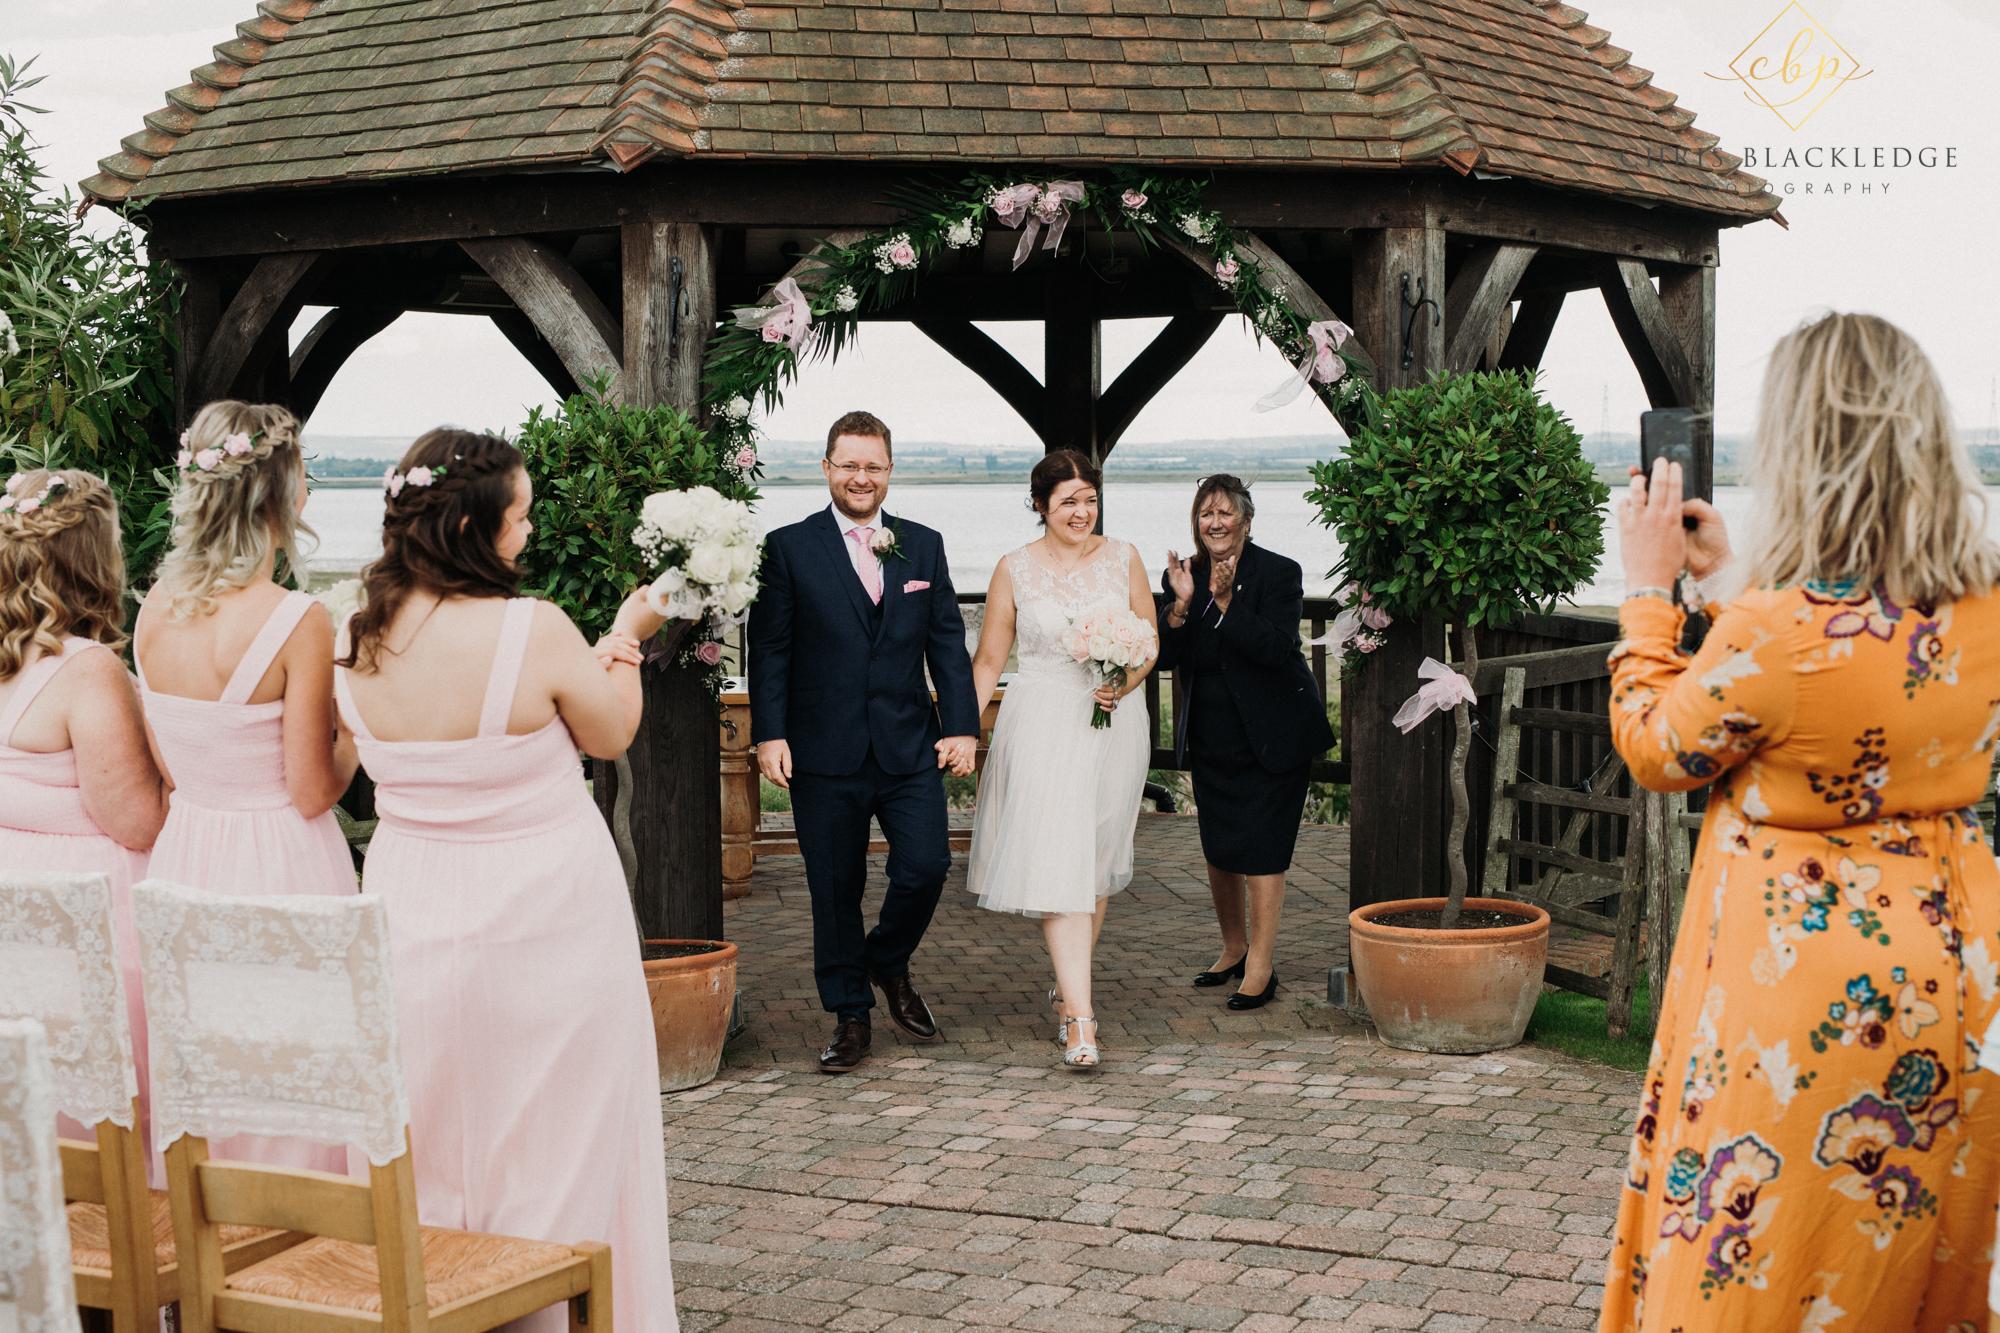 ferry_house_inn_wedding_photographer42.jpg